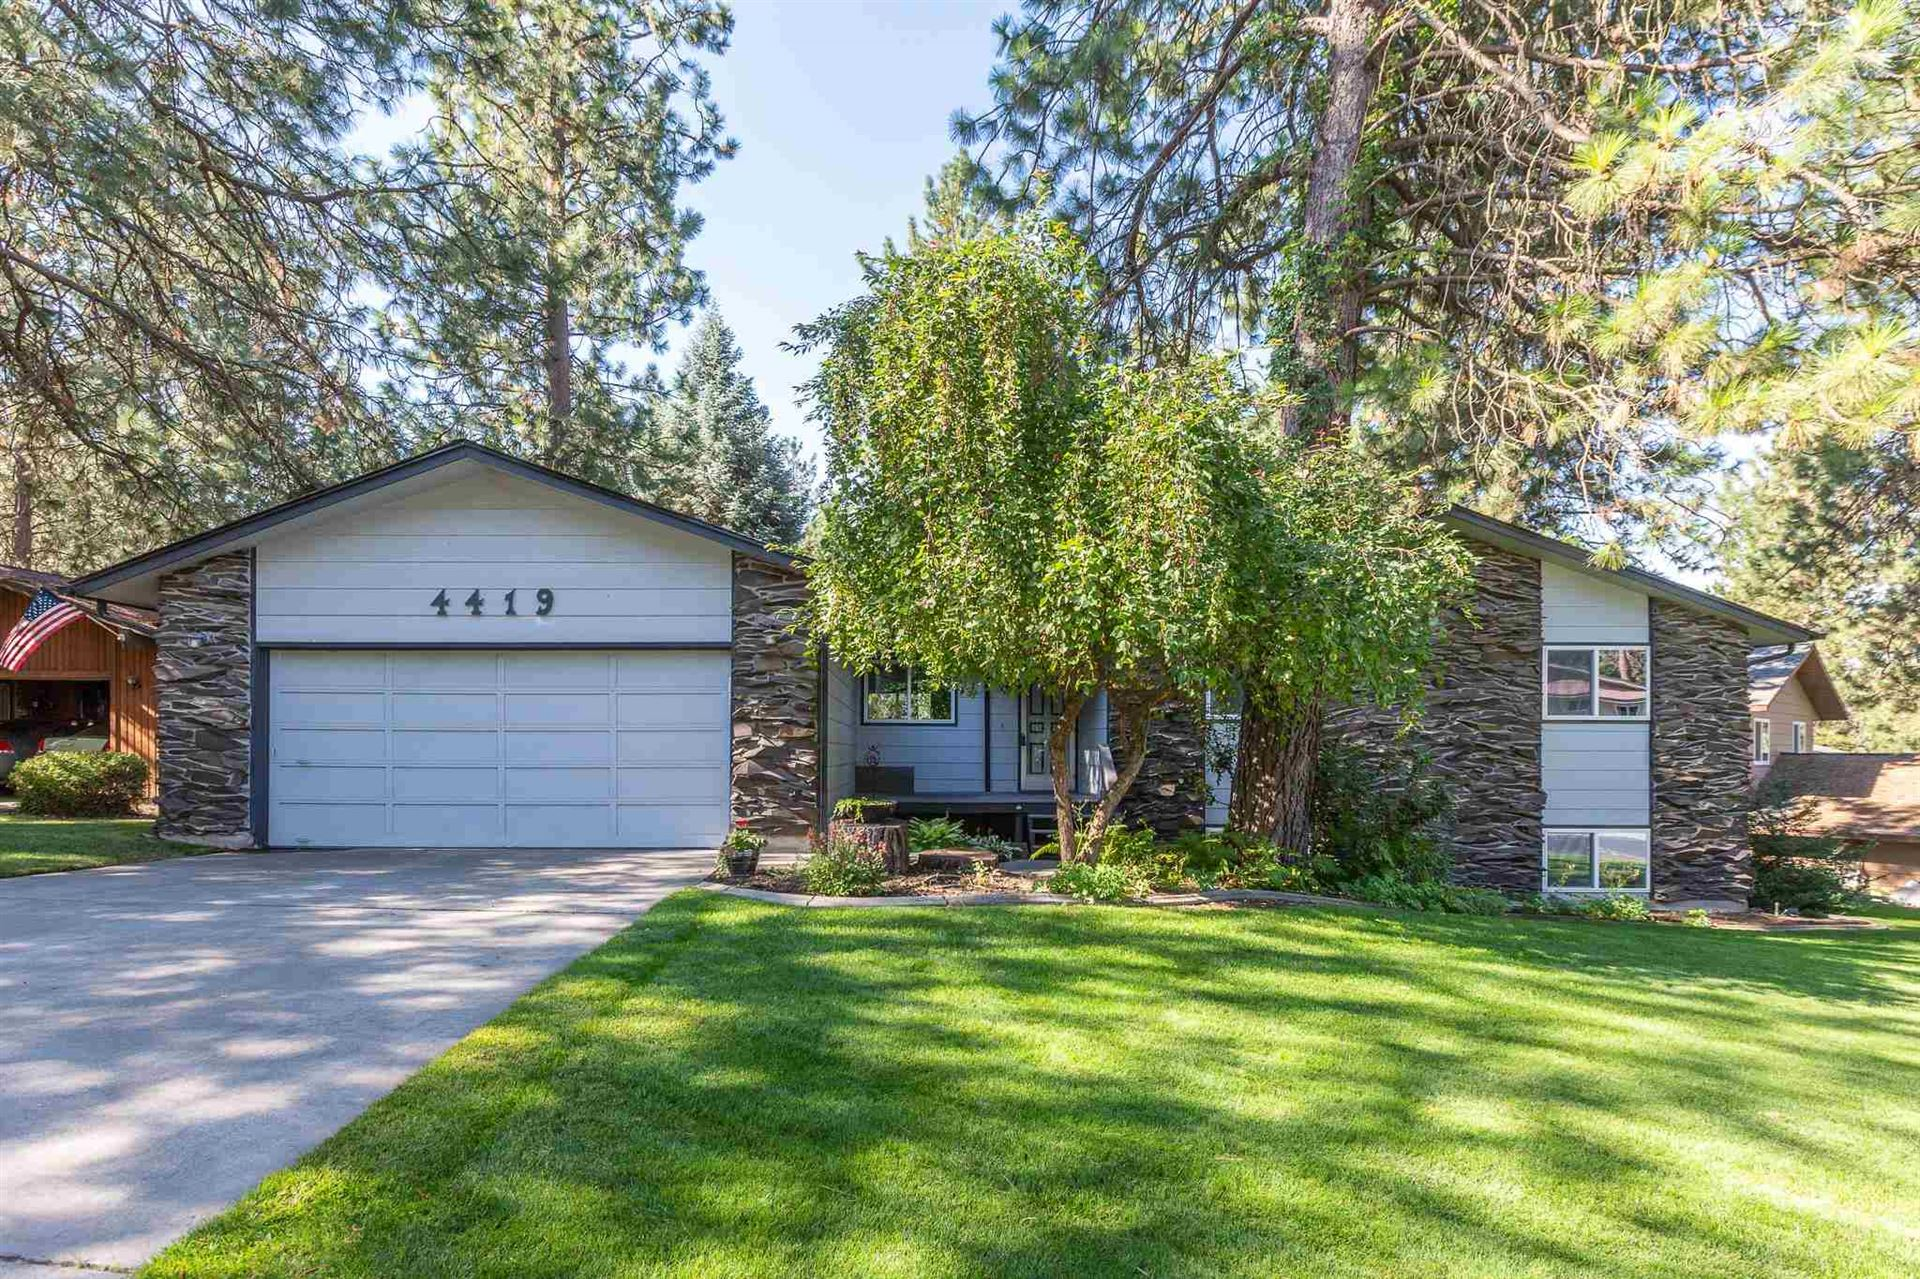 4419 W Elderberry Ave, Spokane, WA 99208 - #: 202120581